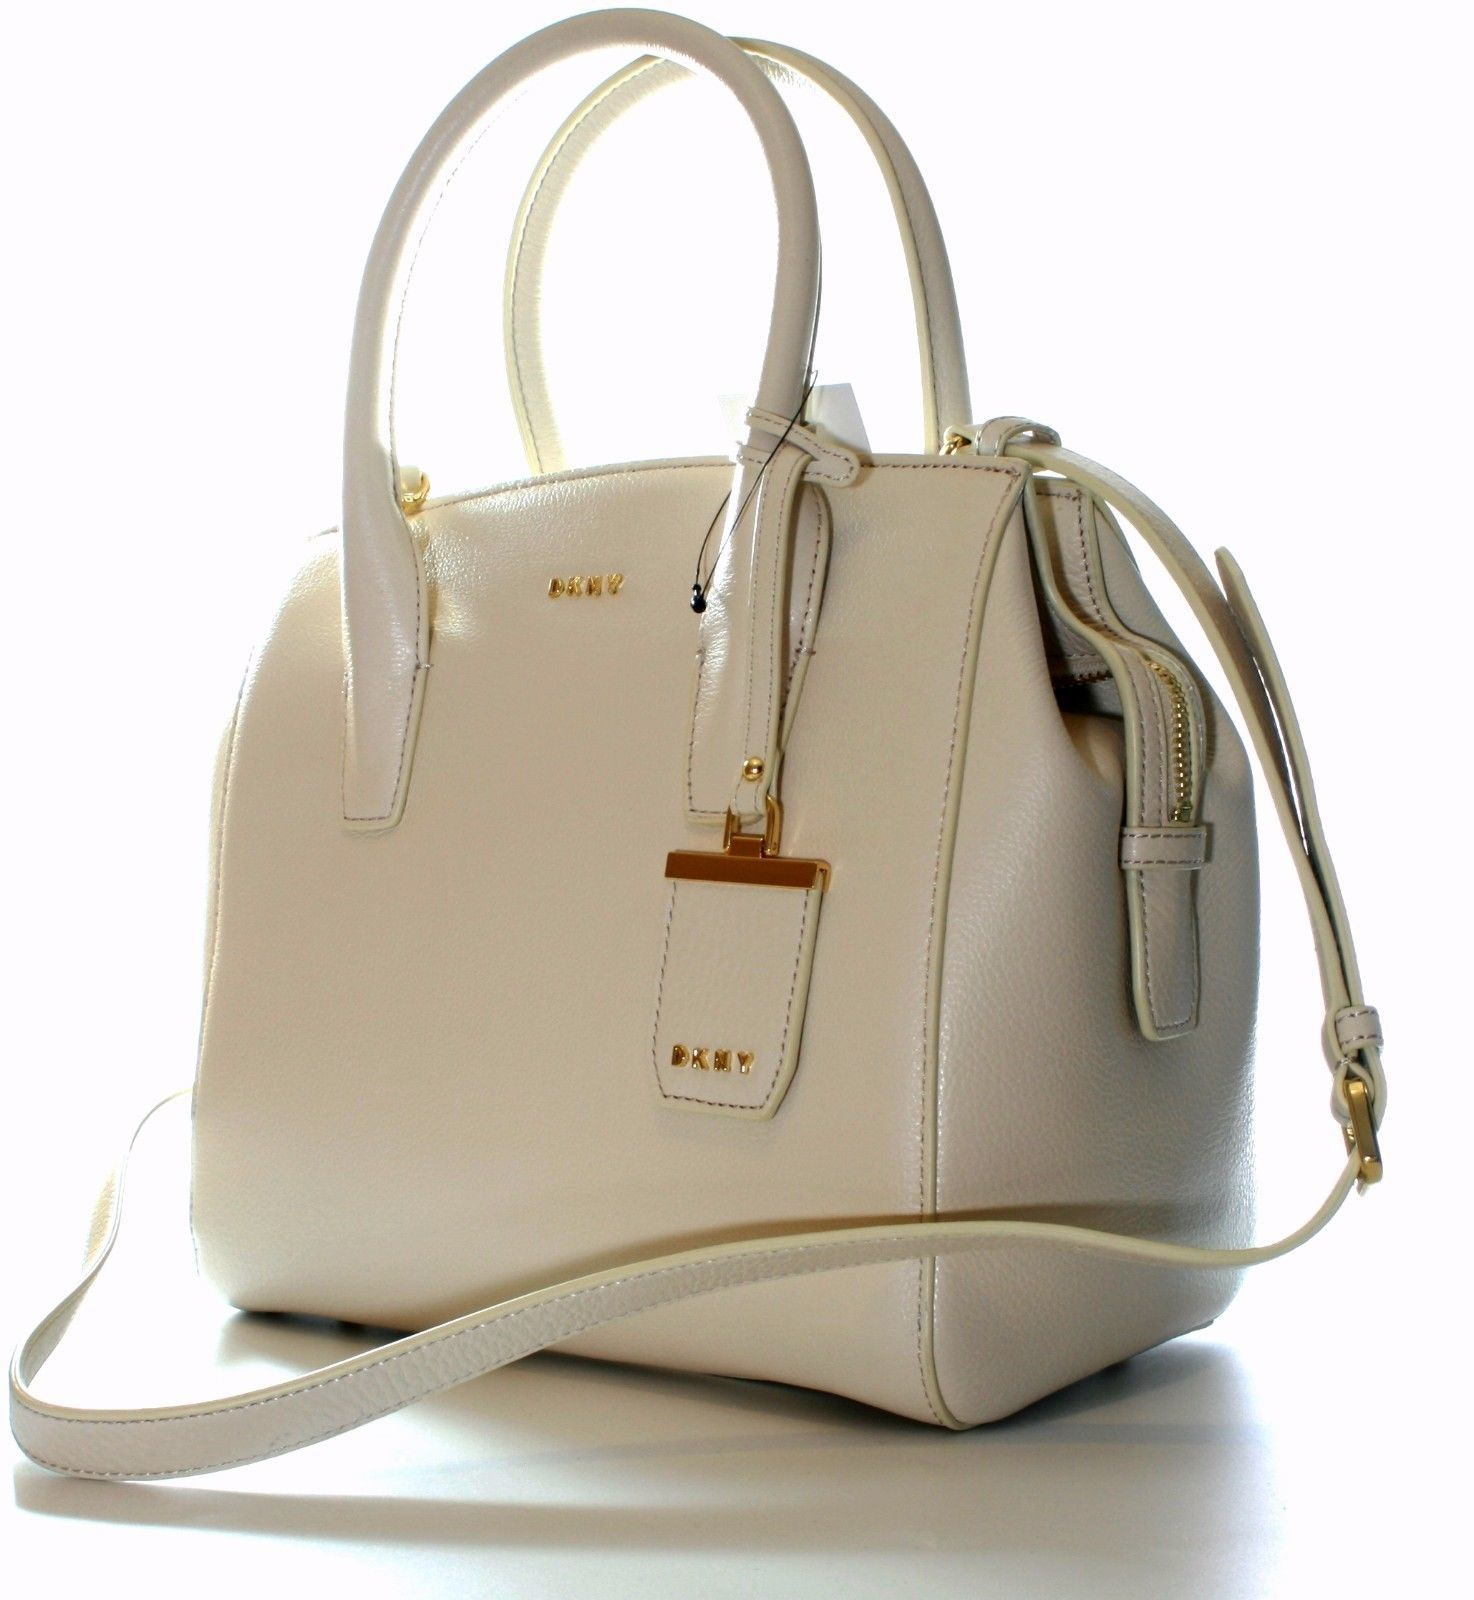 DKNY Donna Karan Sand Dollar Cream Leather Top Handle Bag Medium Handbag